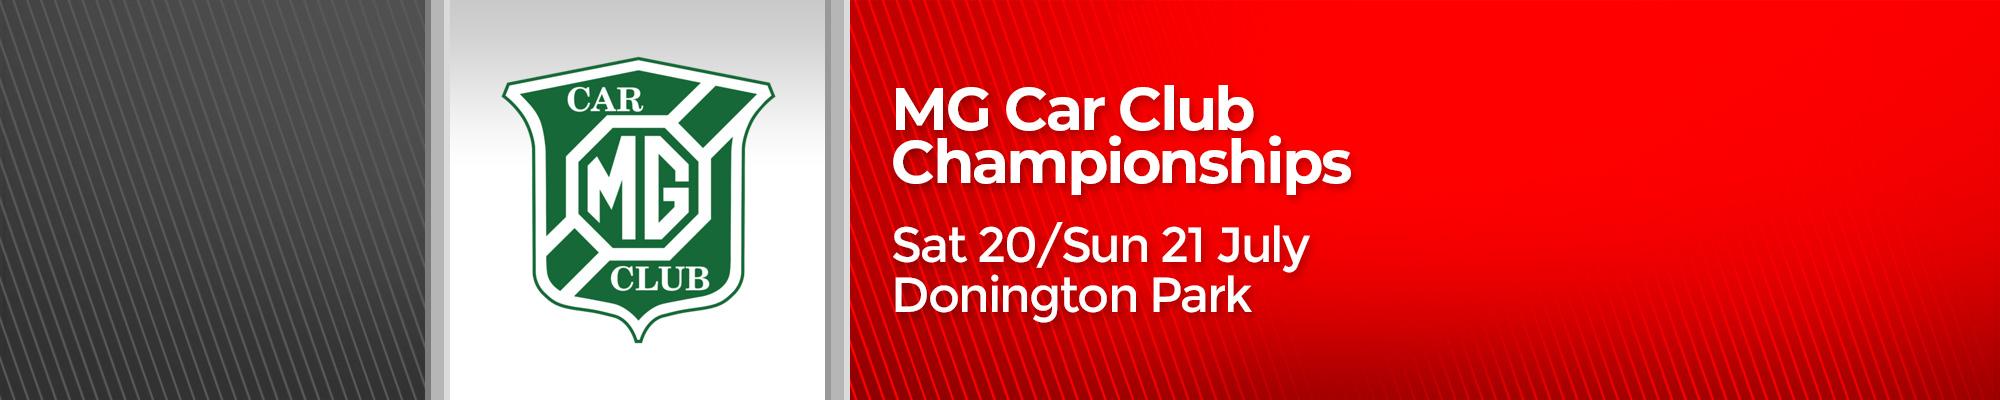 MG Car Club Car Championships